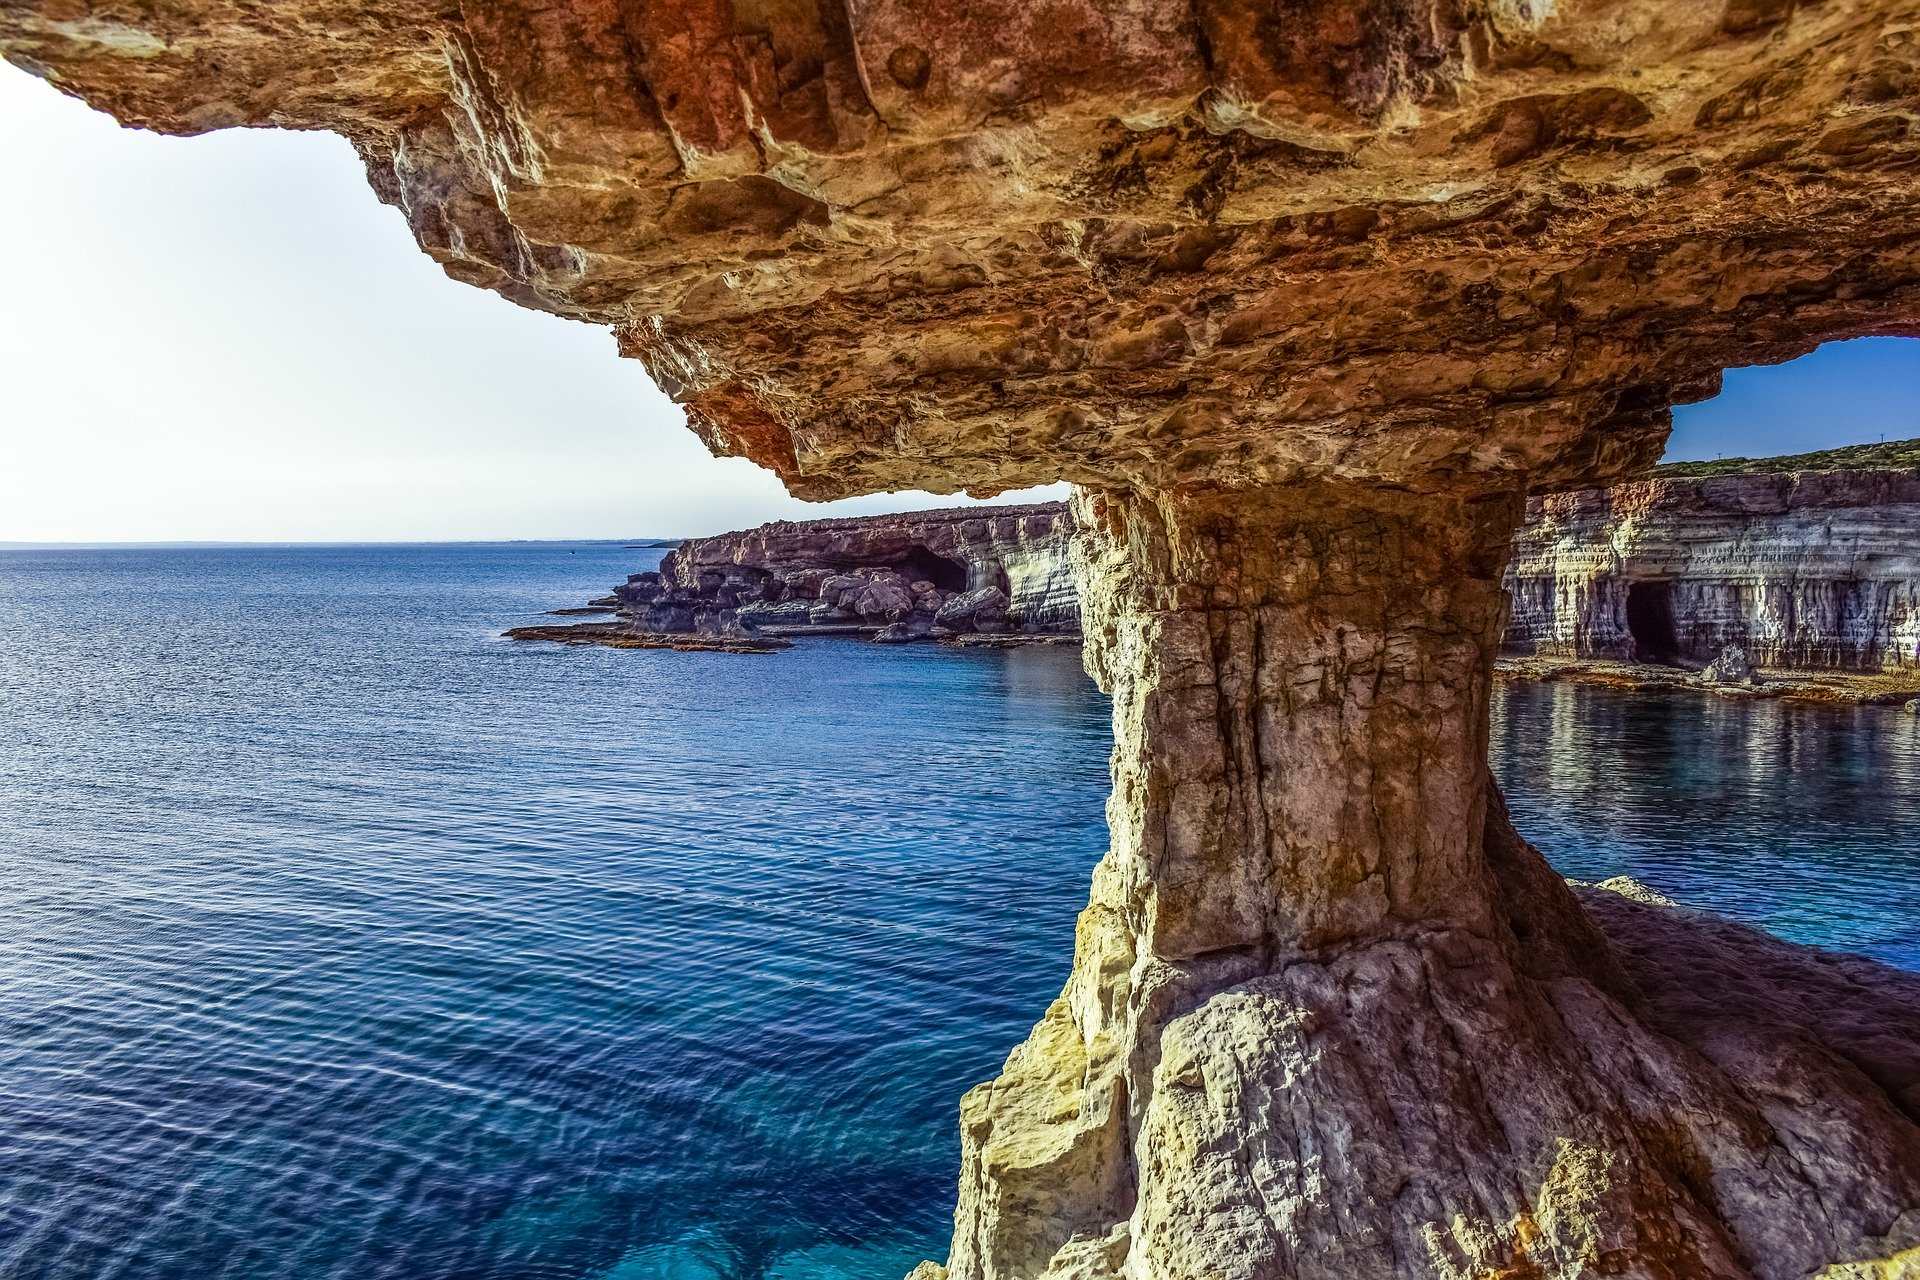 Let's explore Cyprus